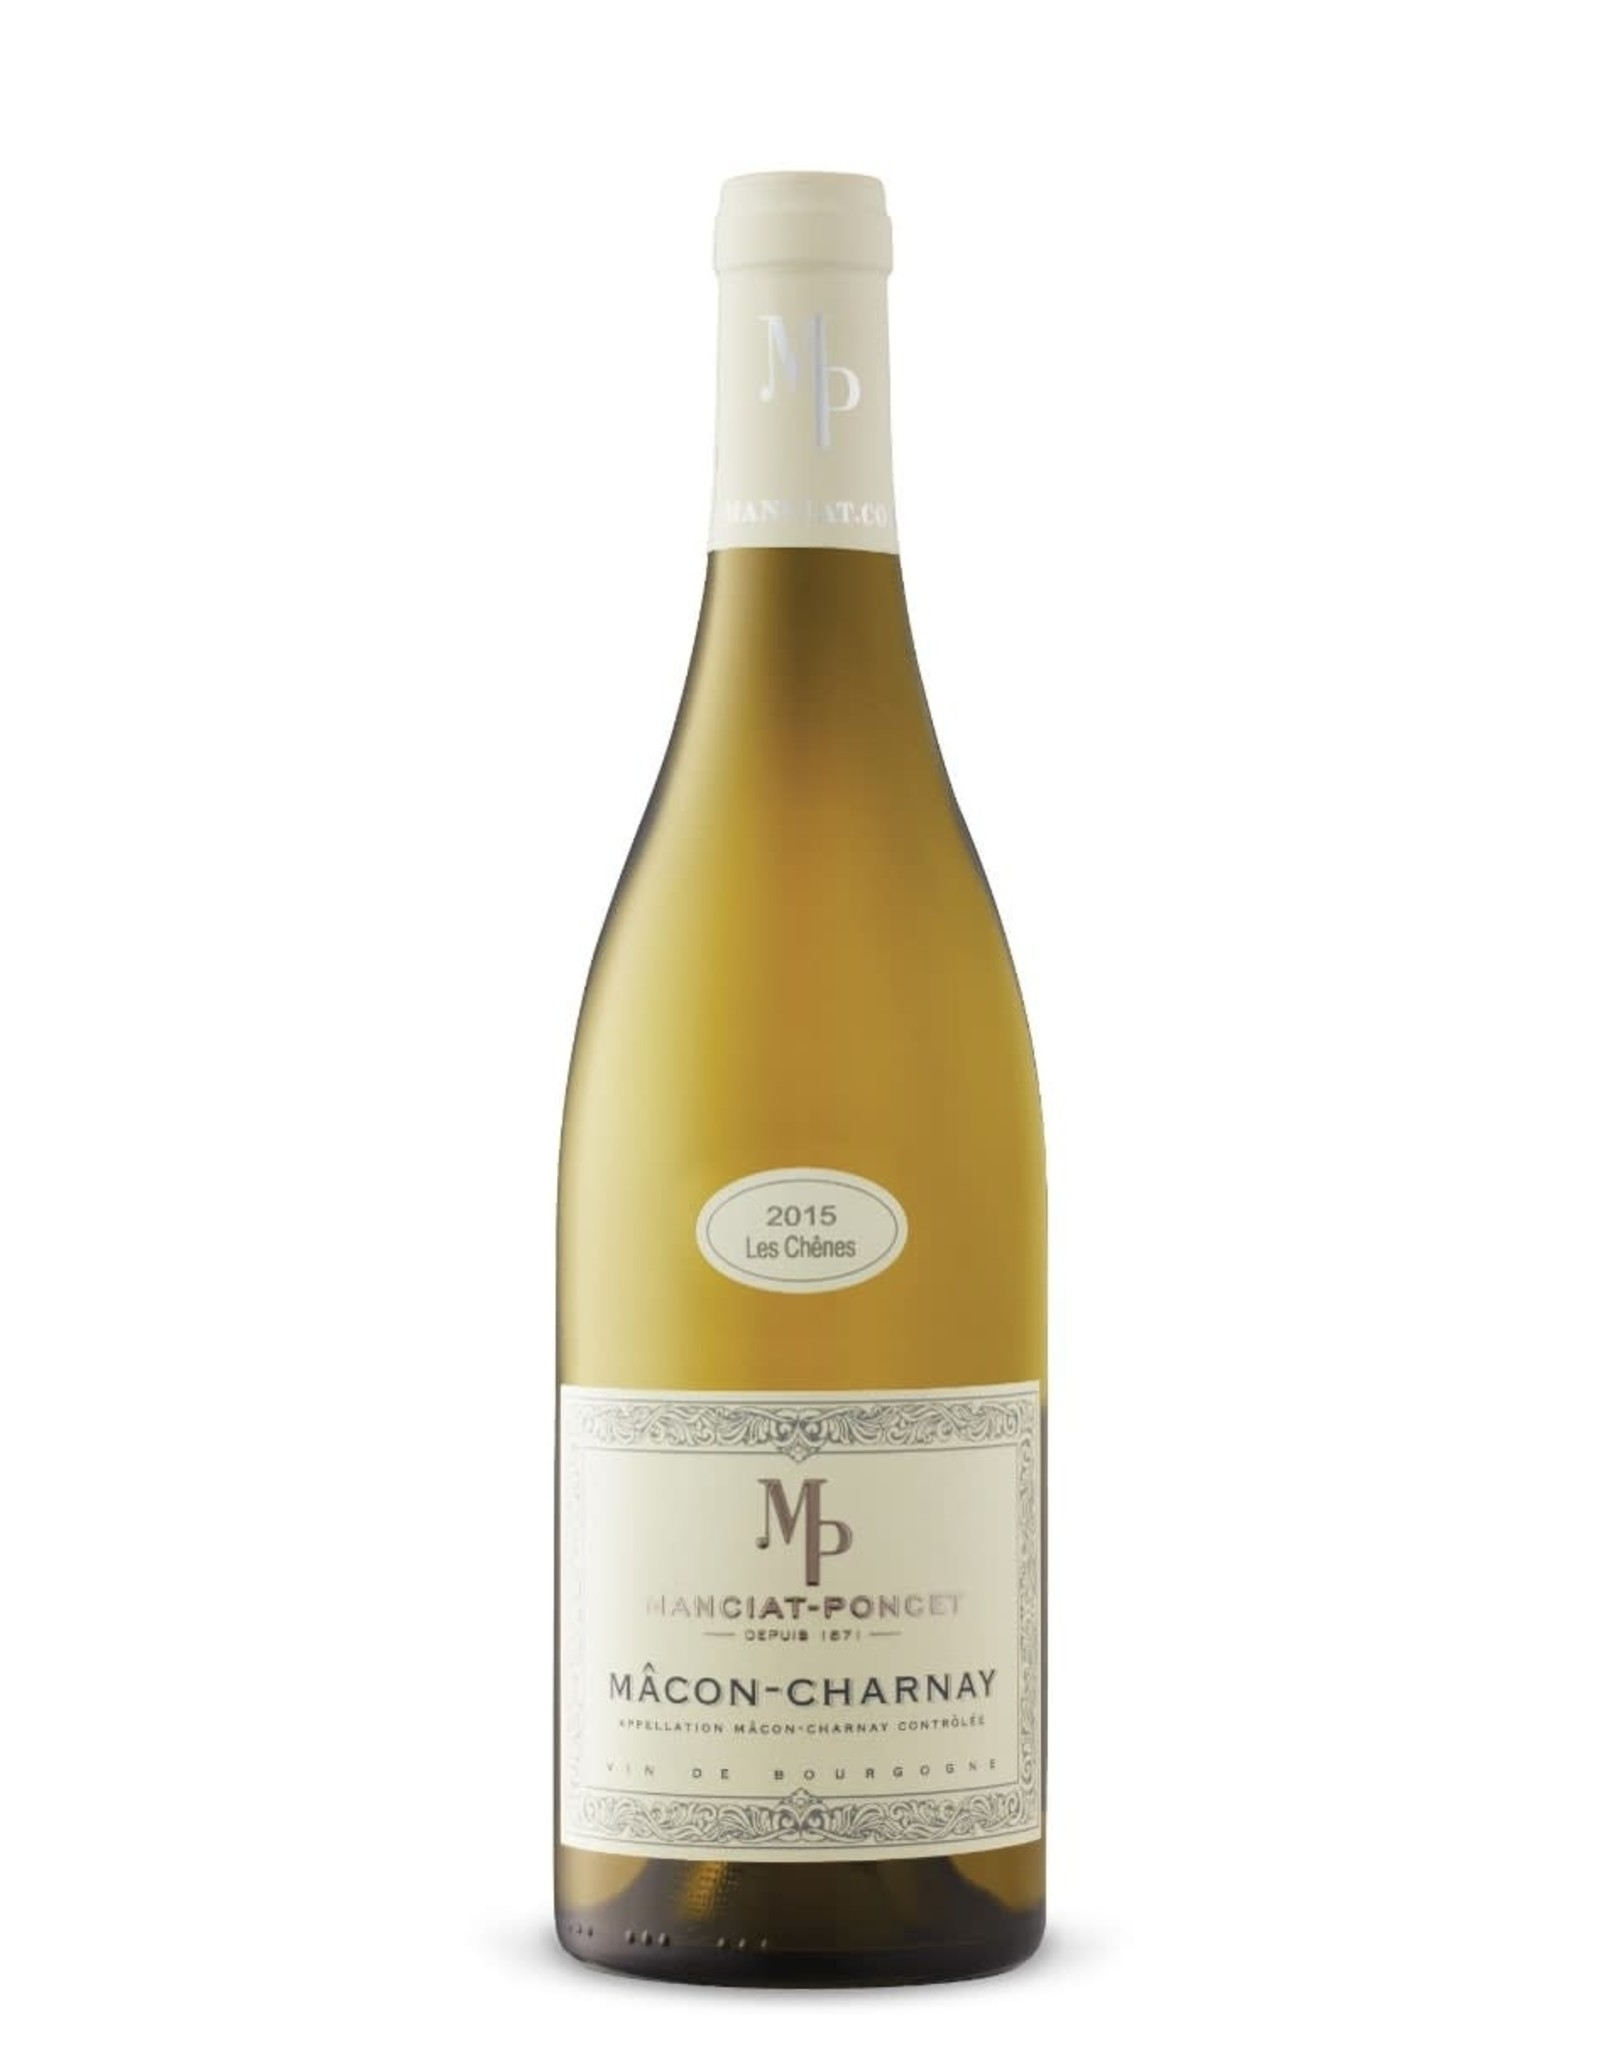 Manciat-Poncet Macon-Charnay